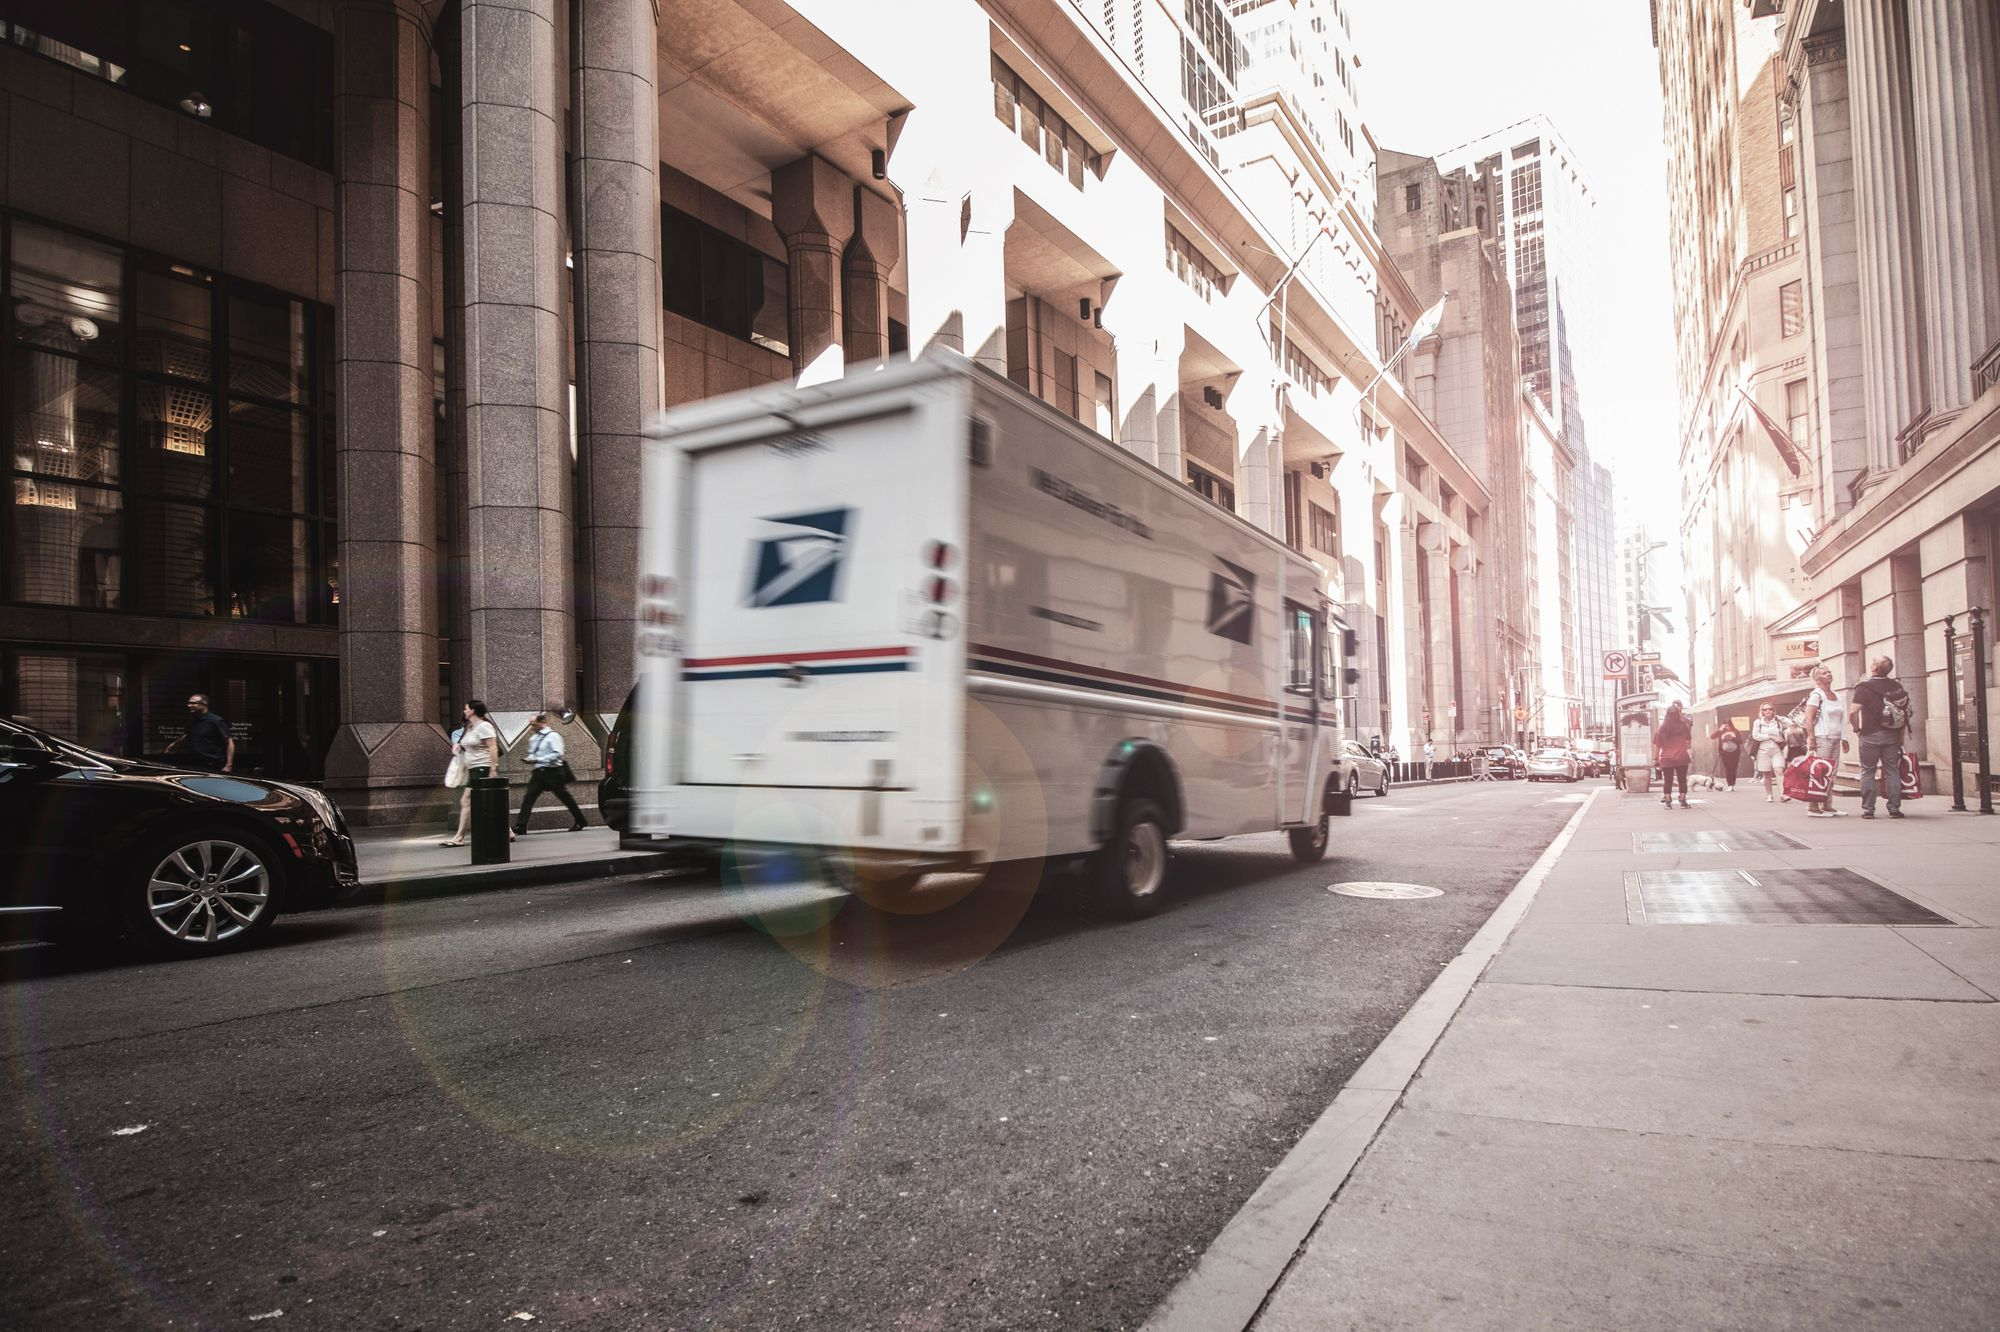 USPS Truck Express vs. Postal Shipping